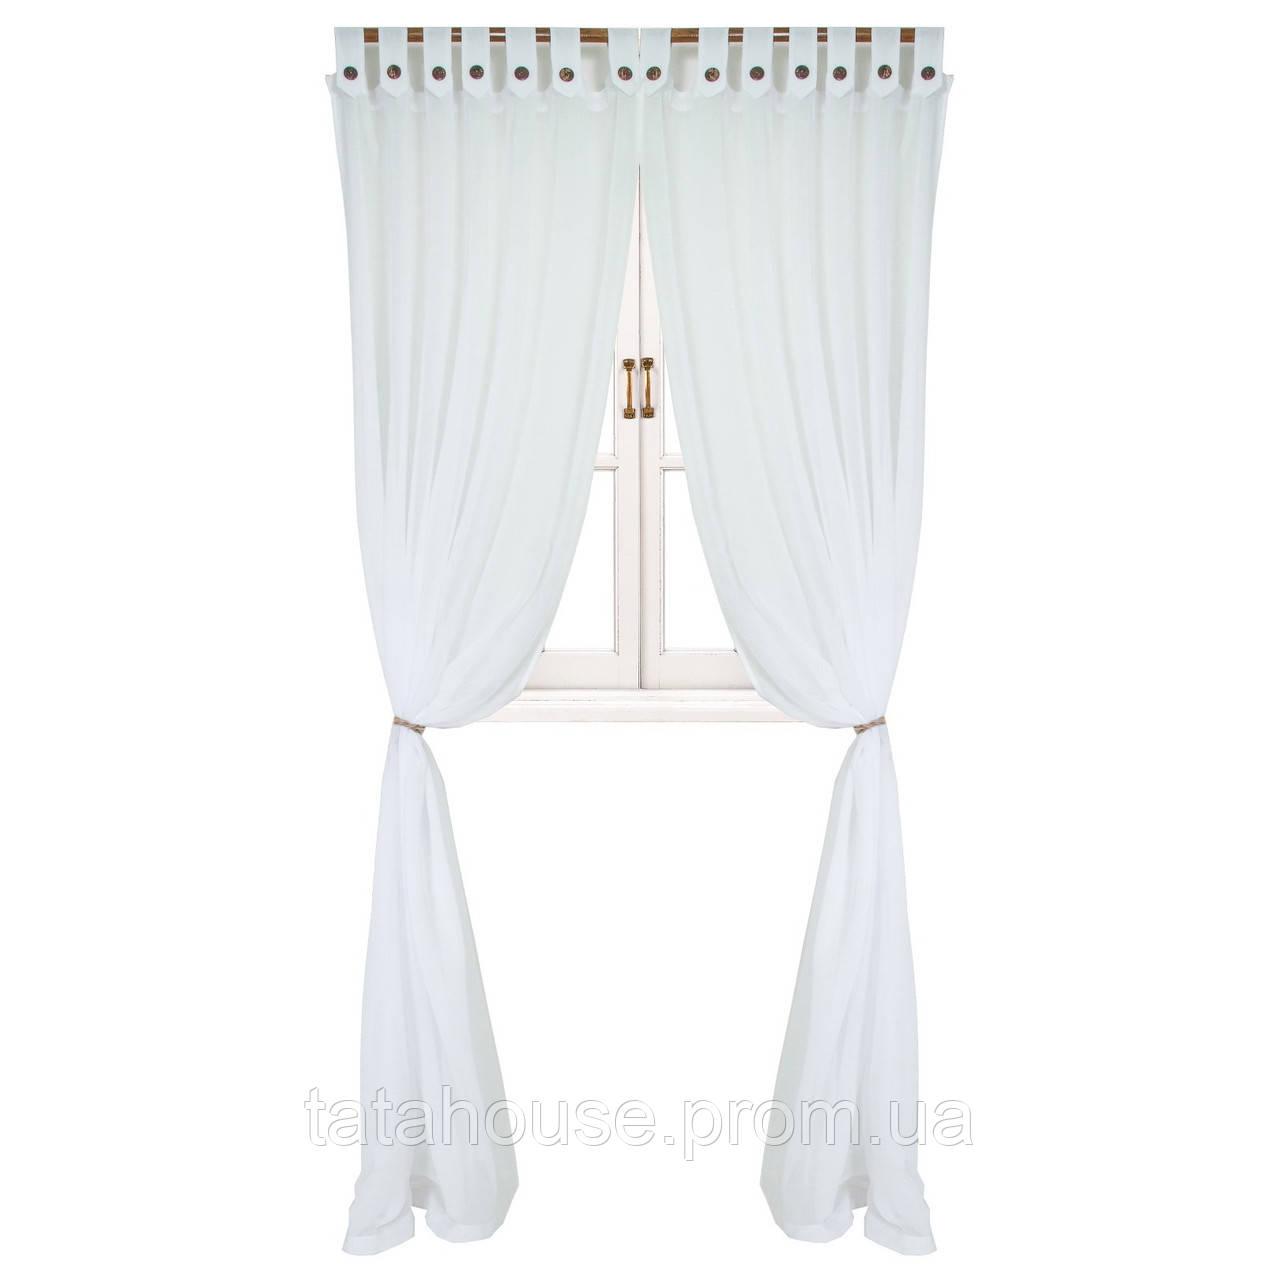 Гардина White с декоративными пуговицами 1 ед 180х250, фото 1